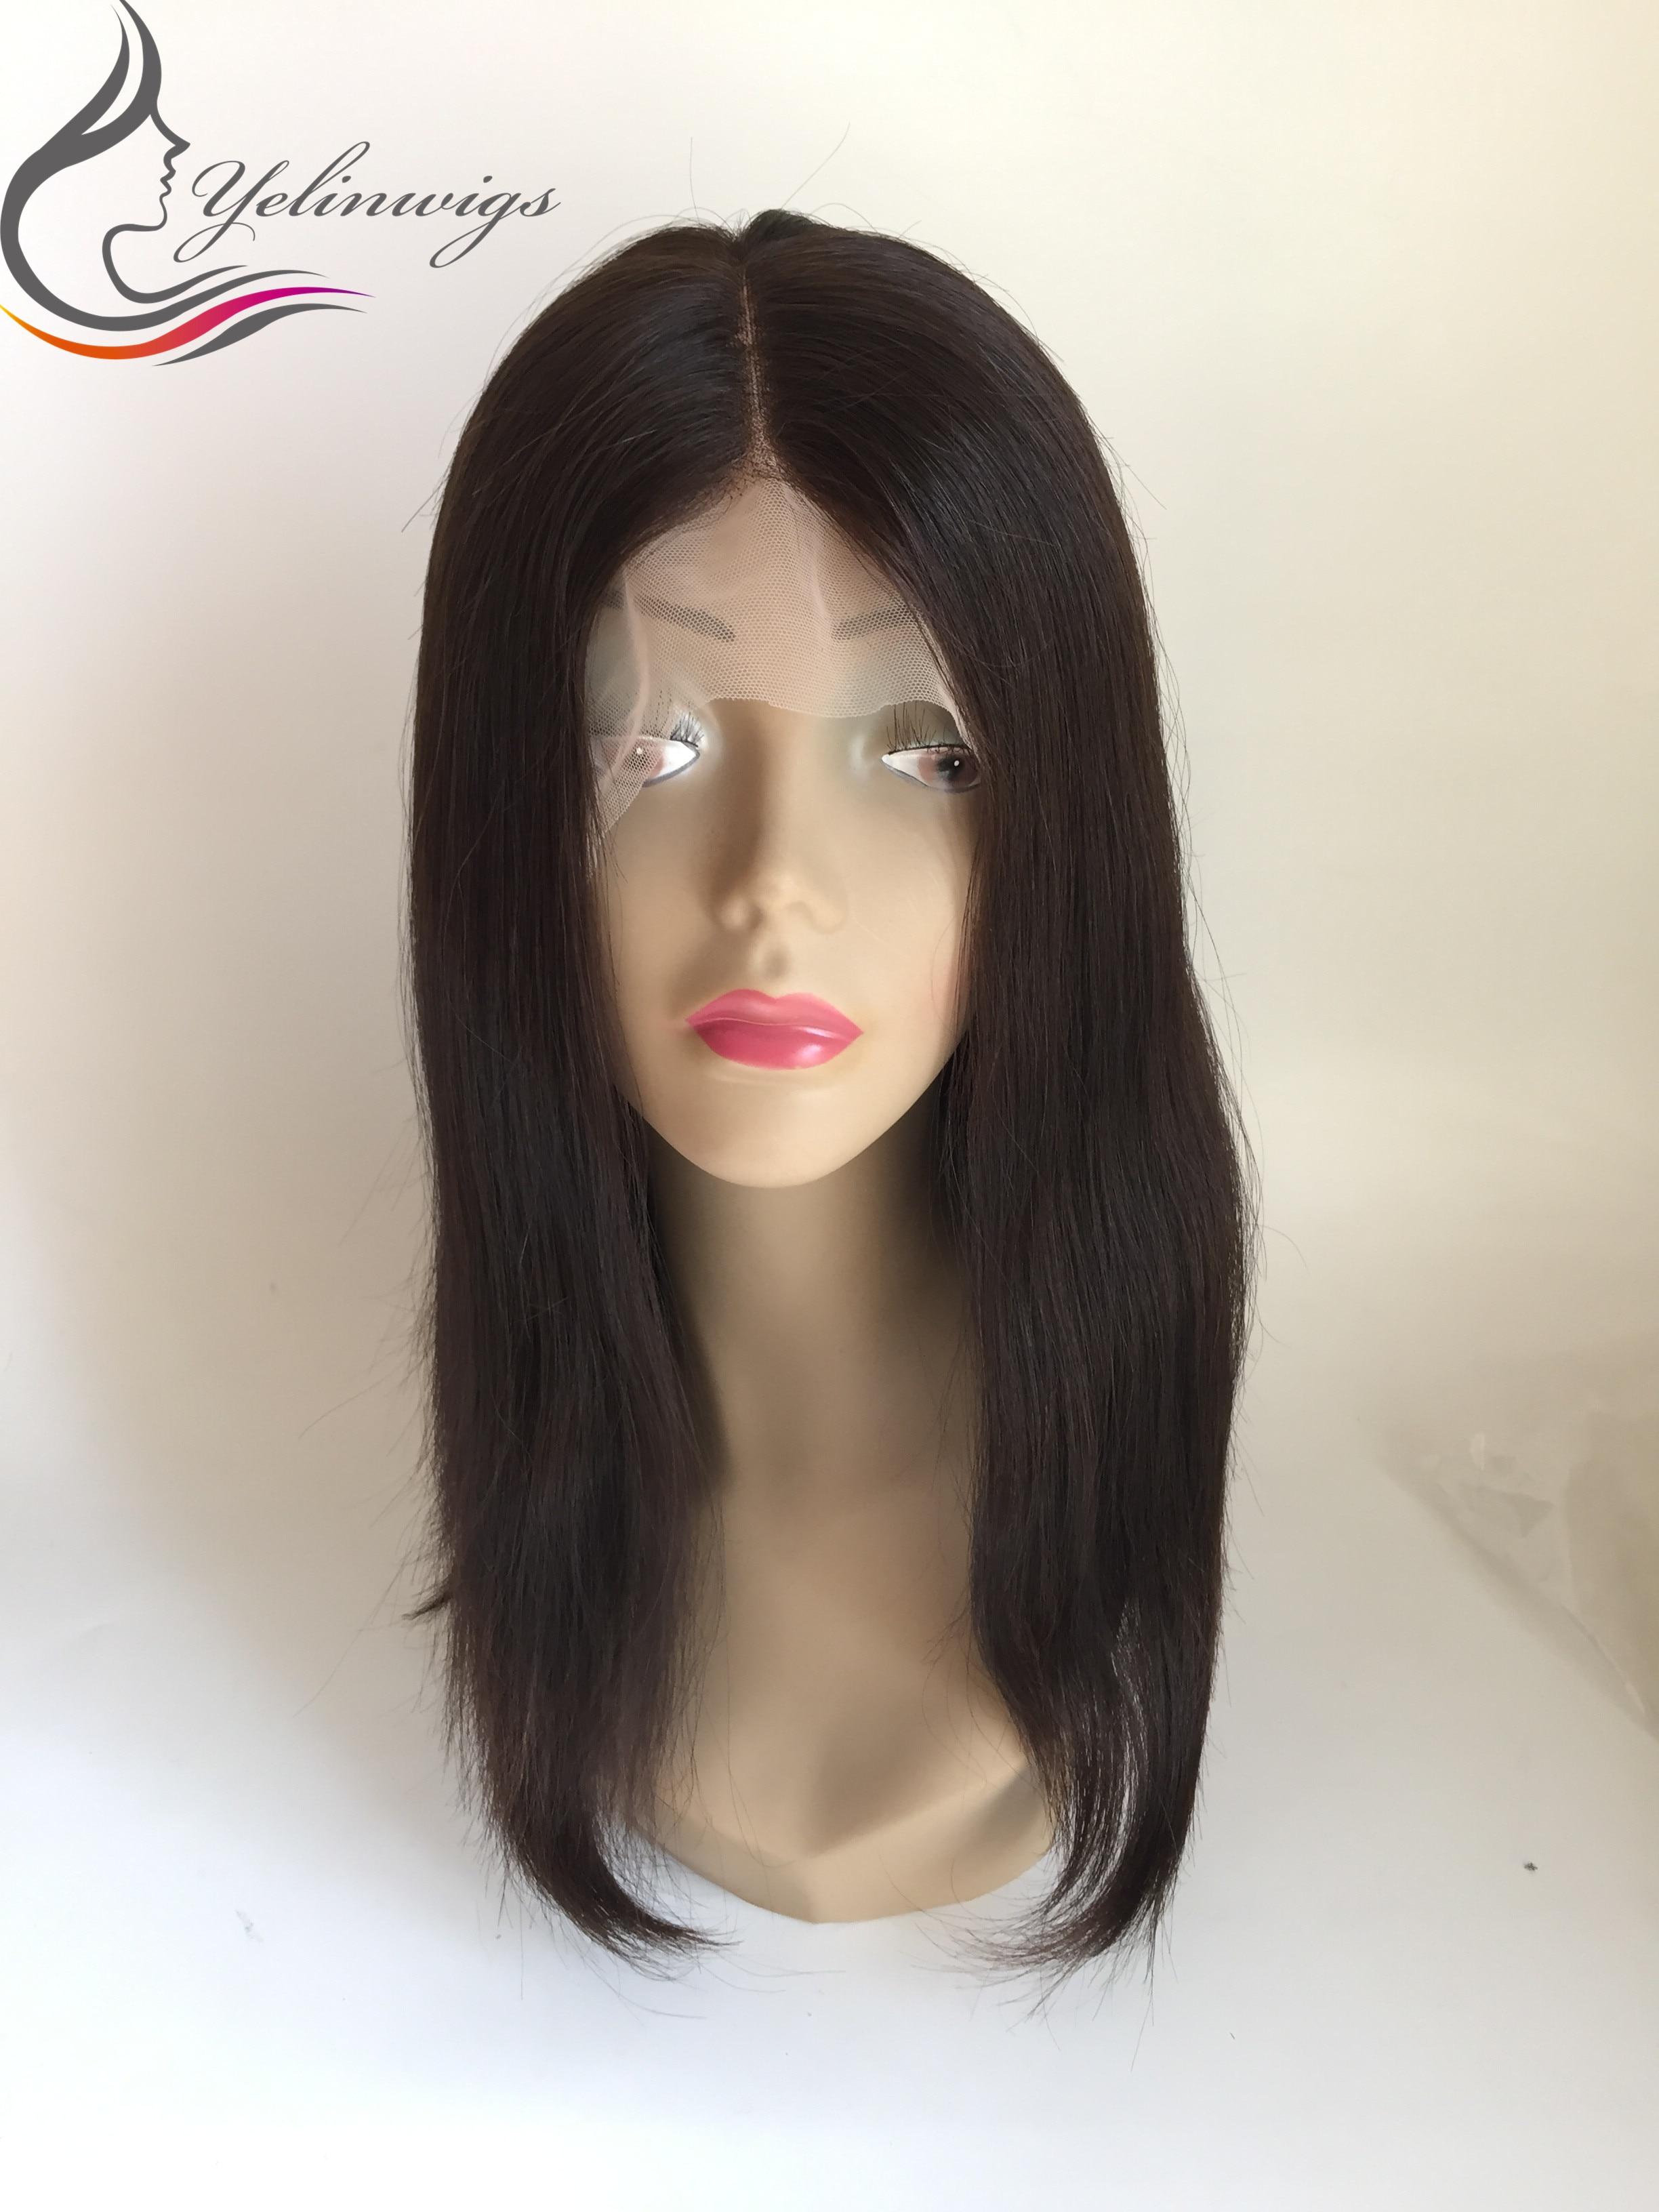 Yelin Wig 100% European Virgin Hair Lace Top Jewish Wig Kosher Wig Lace Top Wigs Free Shipping